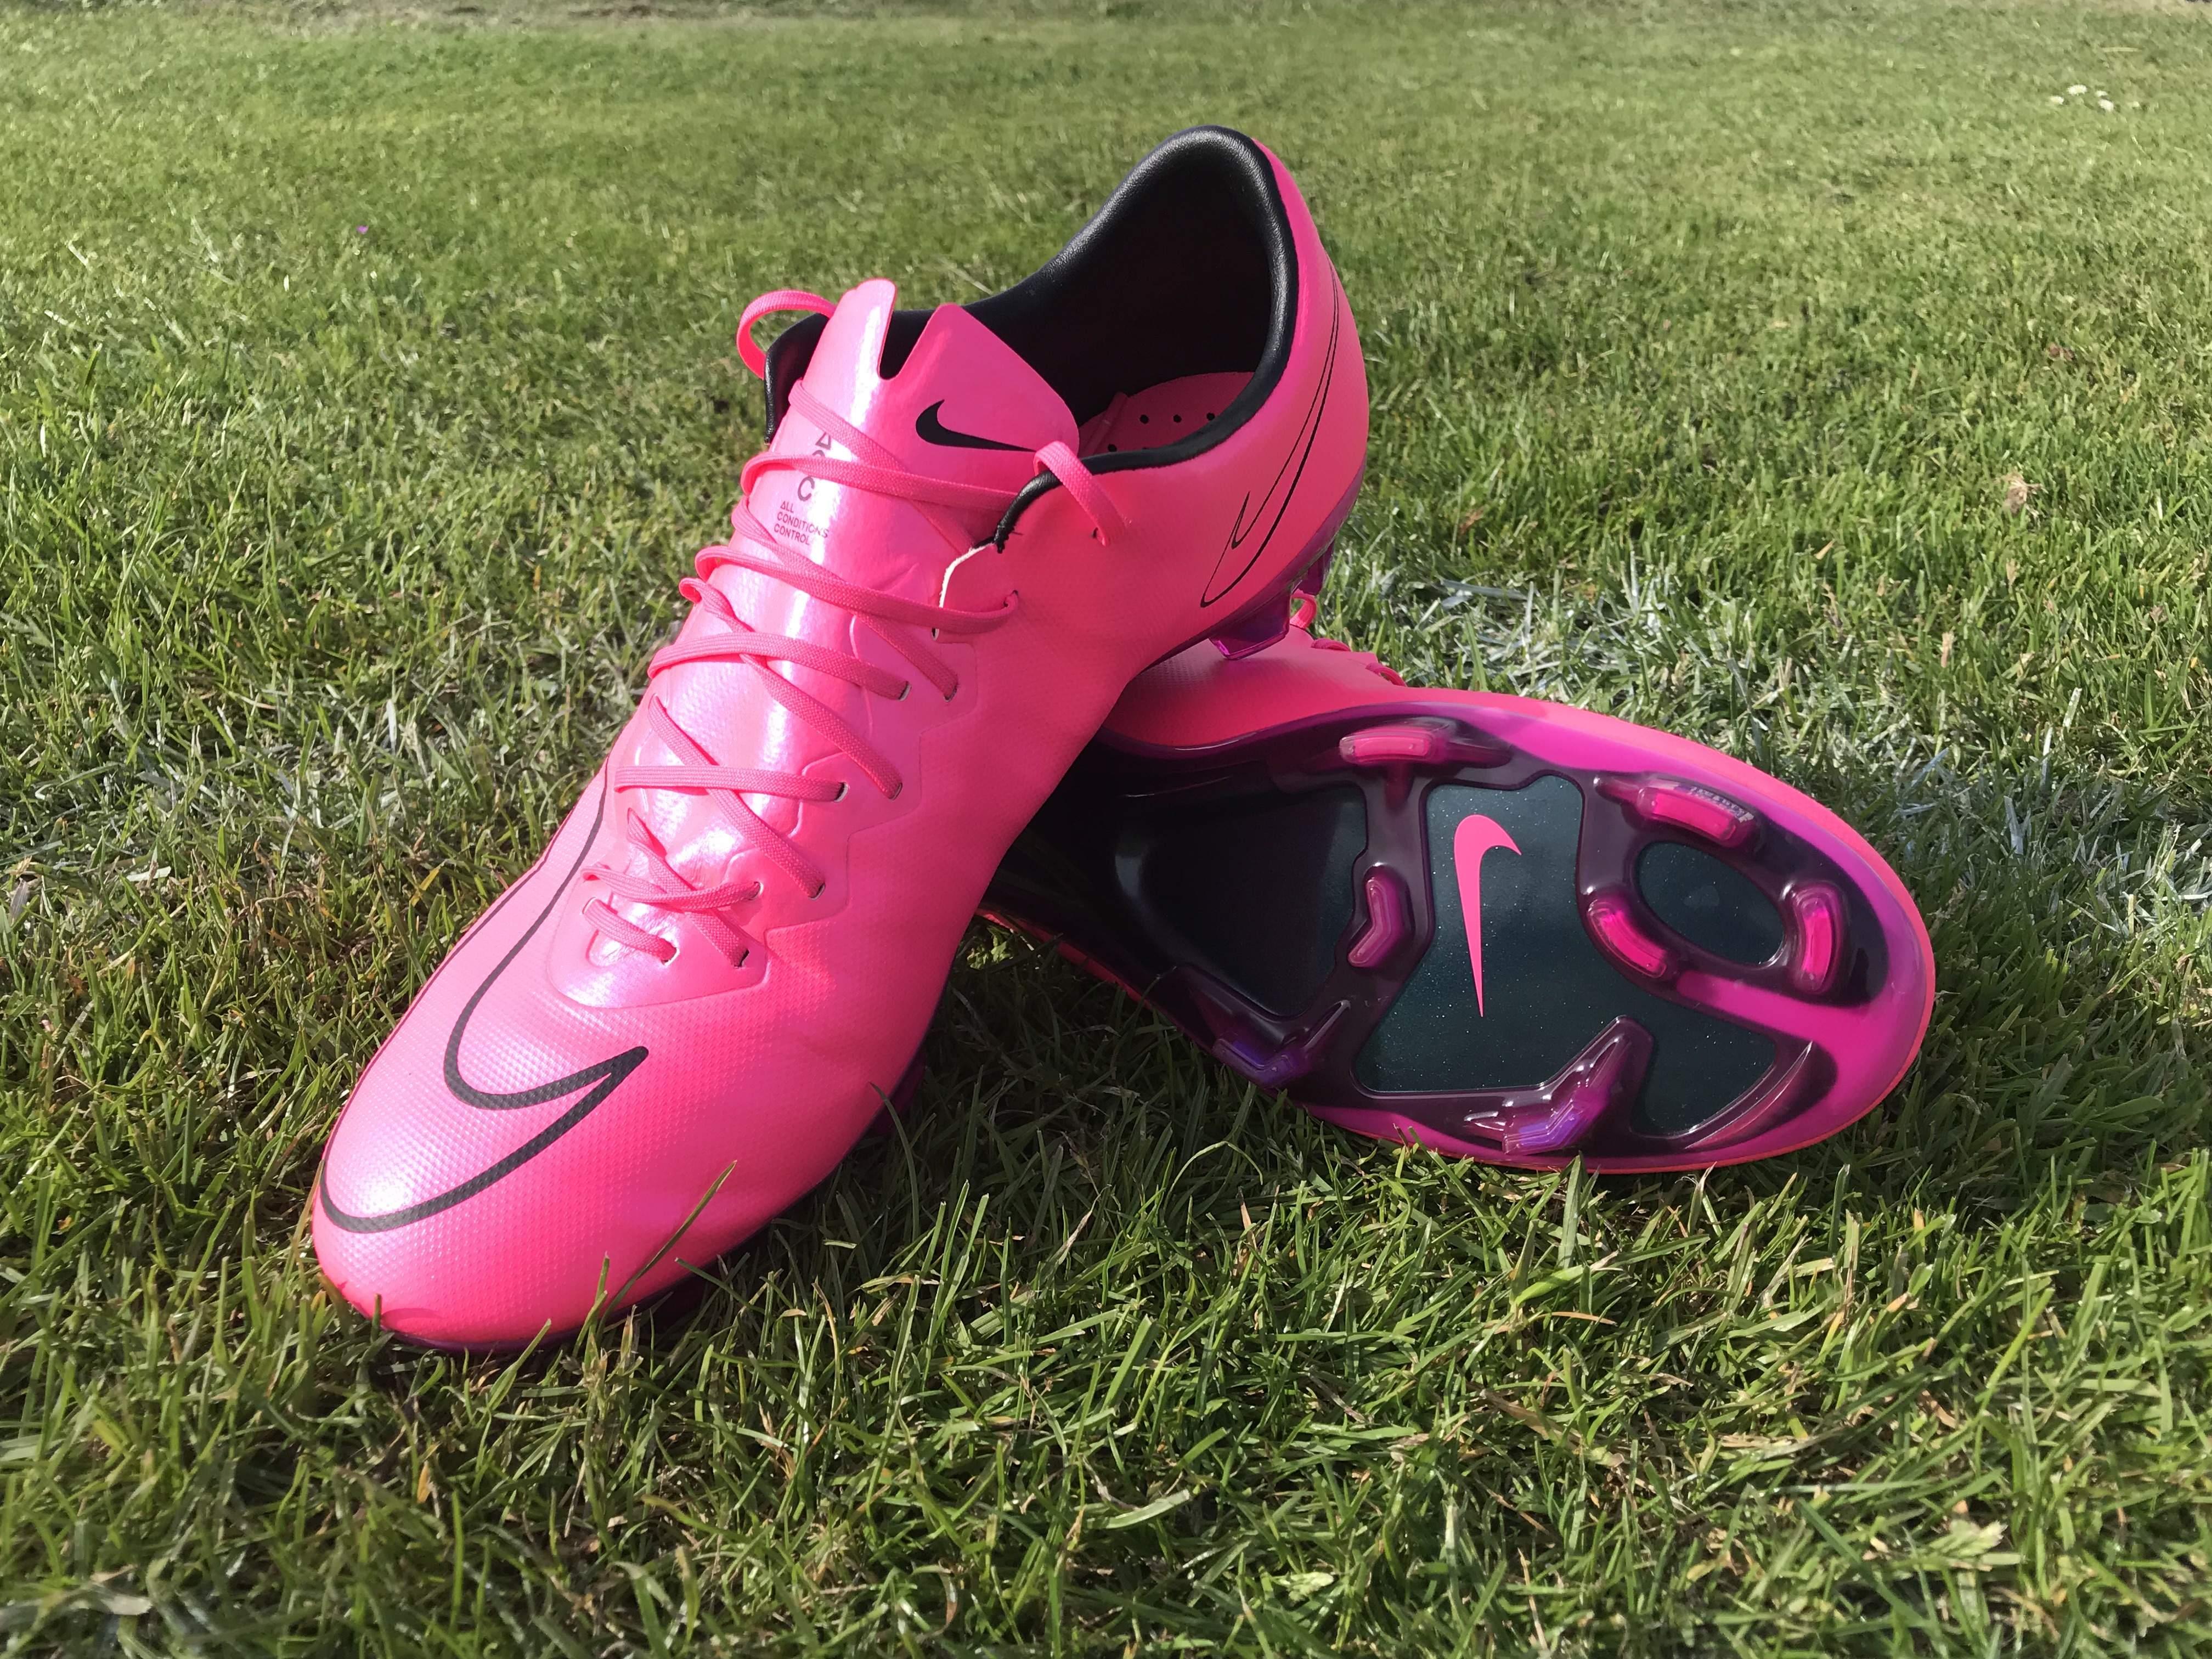 official photos 75c4b 70db7 Nike Mercurial Vapor X Lightning Storm ACC FG - Hyper Pink ...